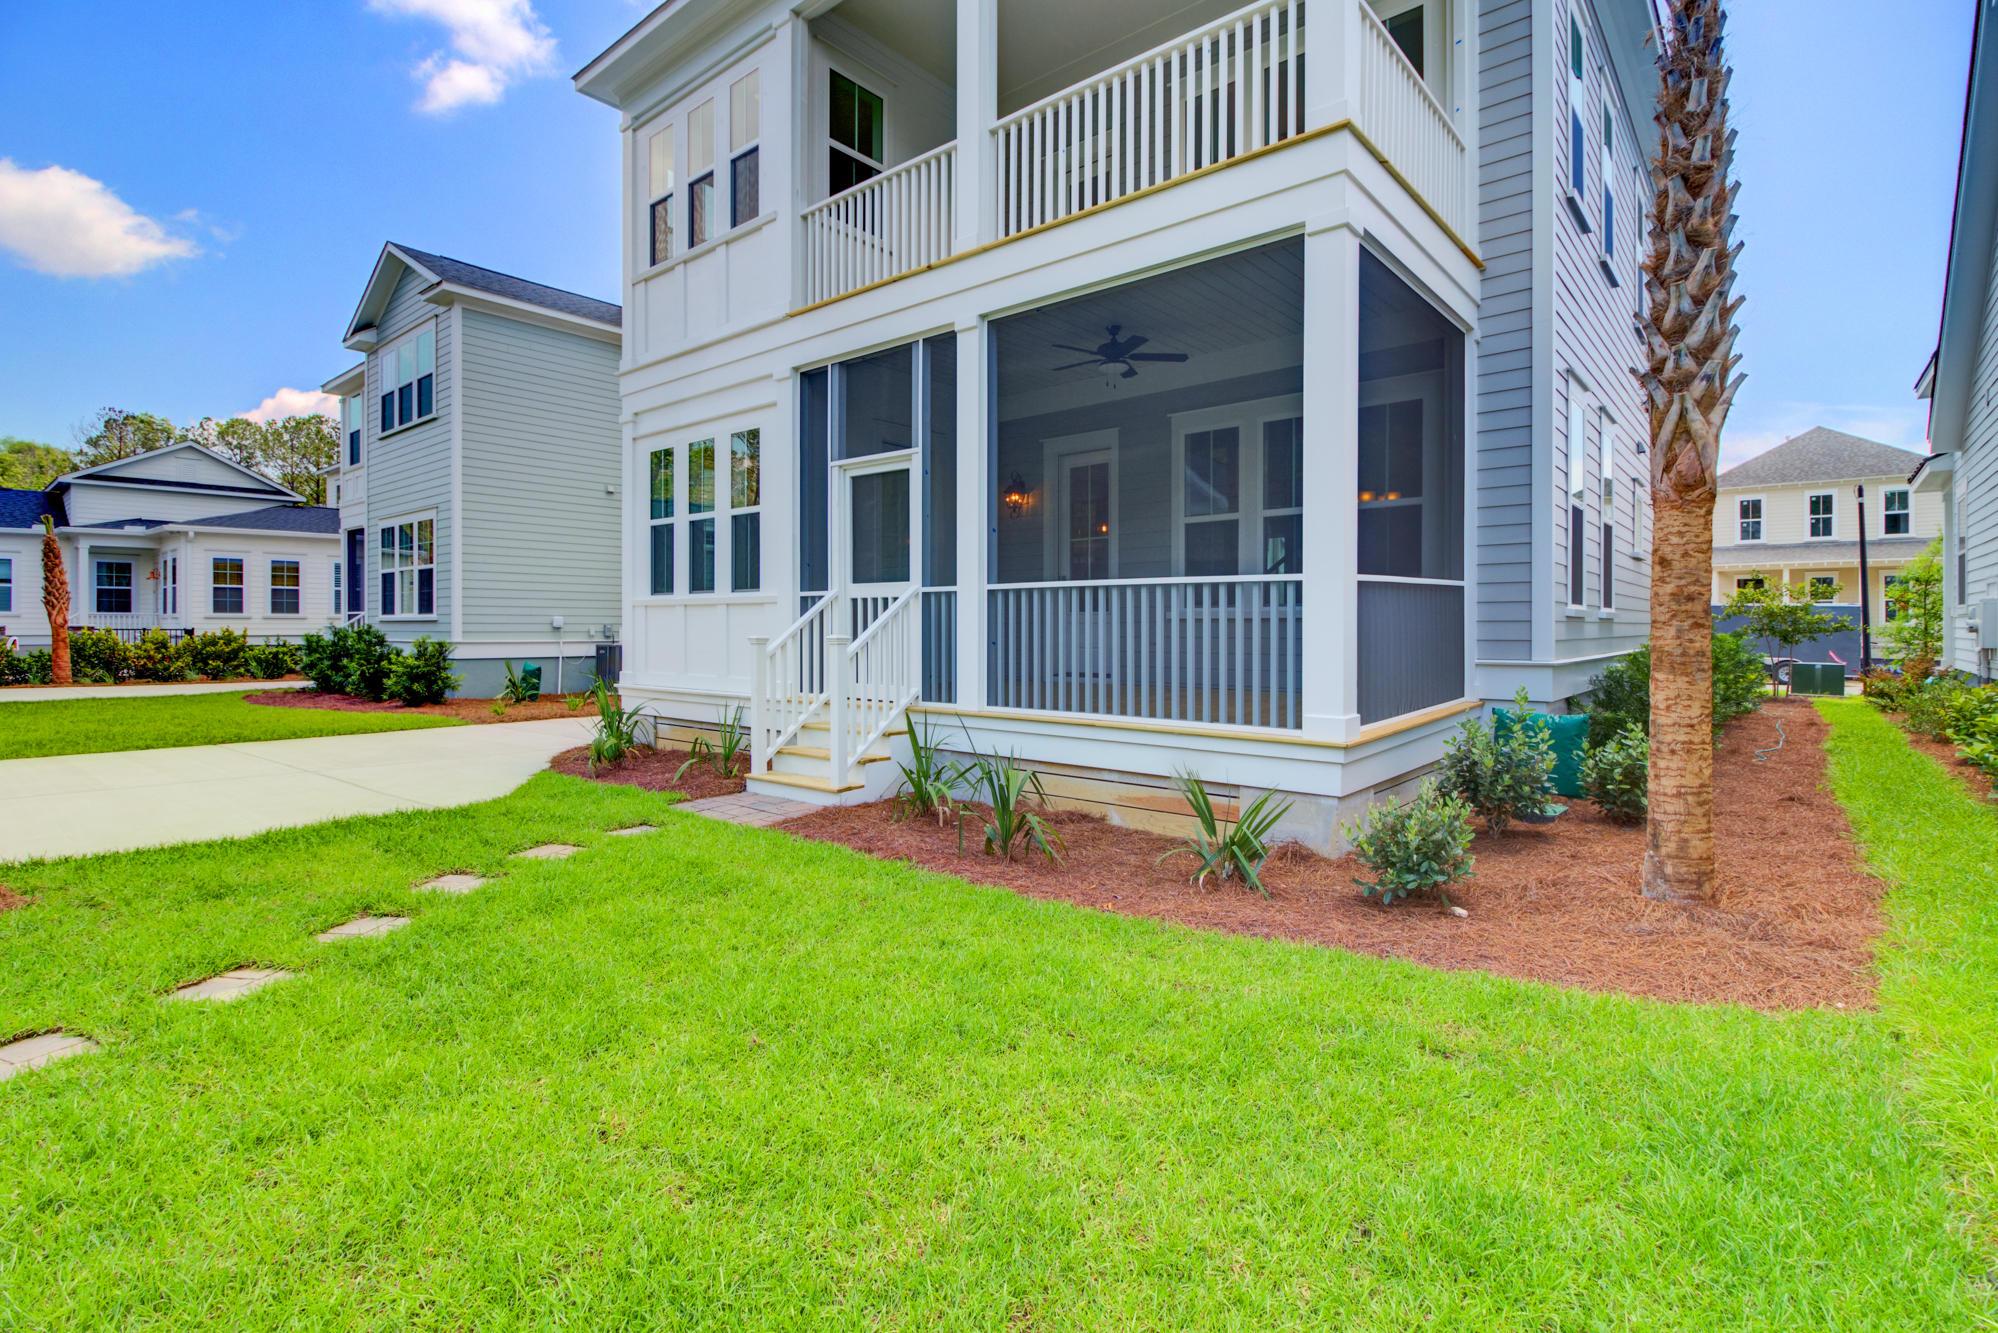 Carolina Park Homes For Sale - 3582 Backshore, Mount Pleasant, SC - 7